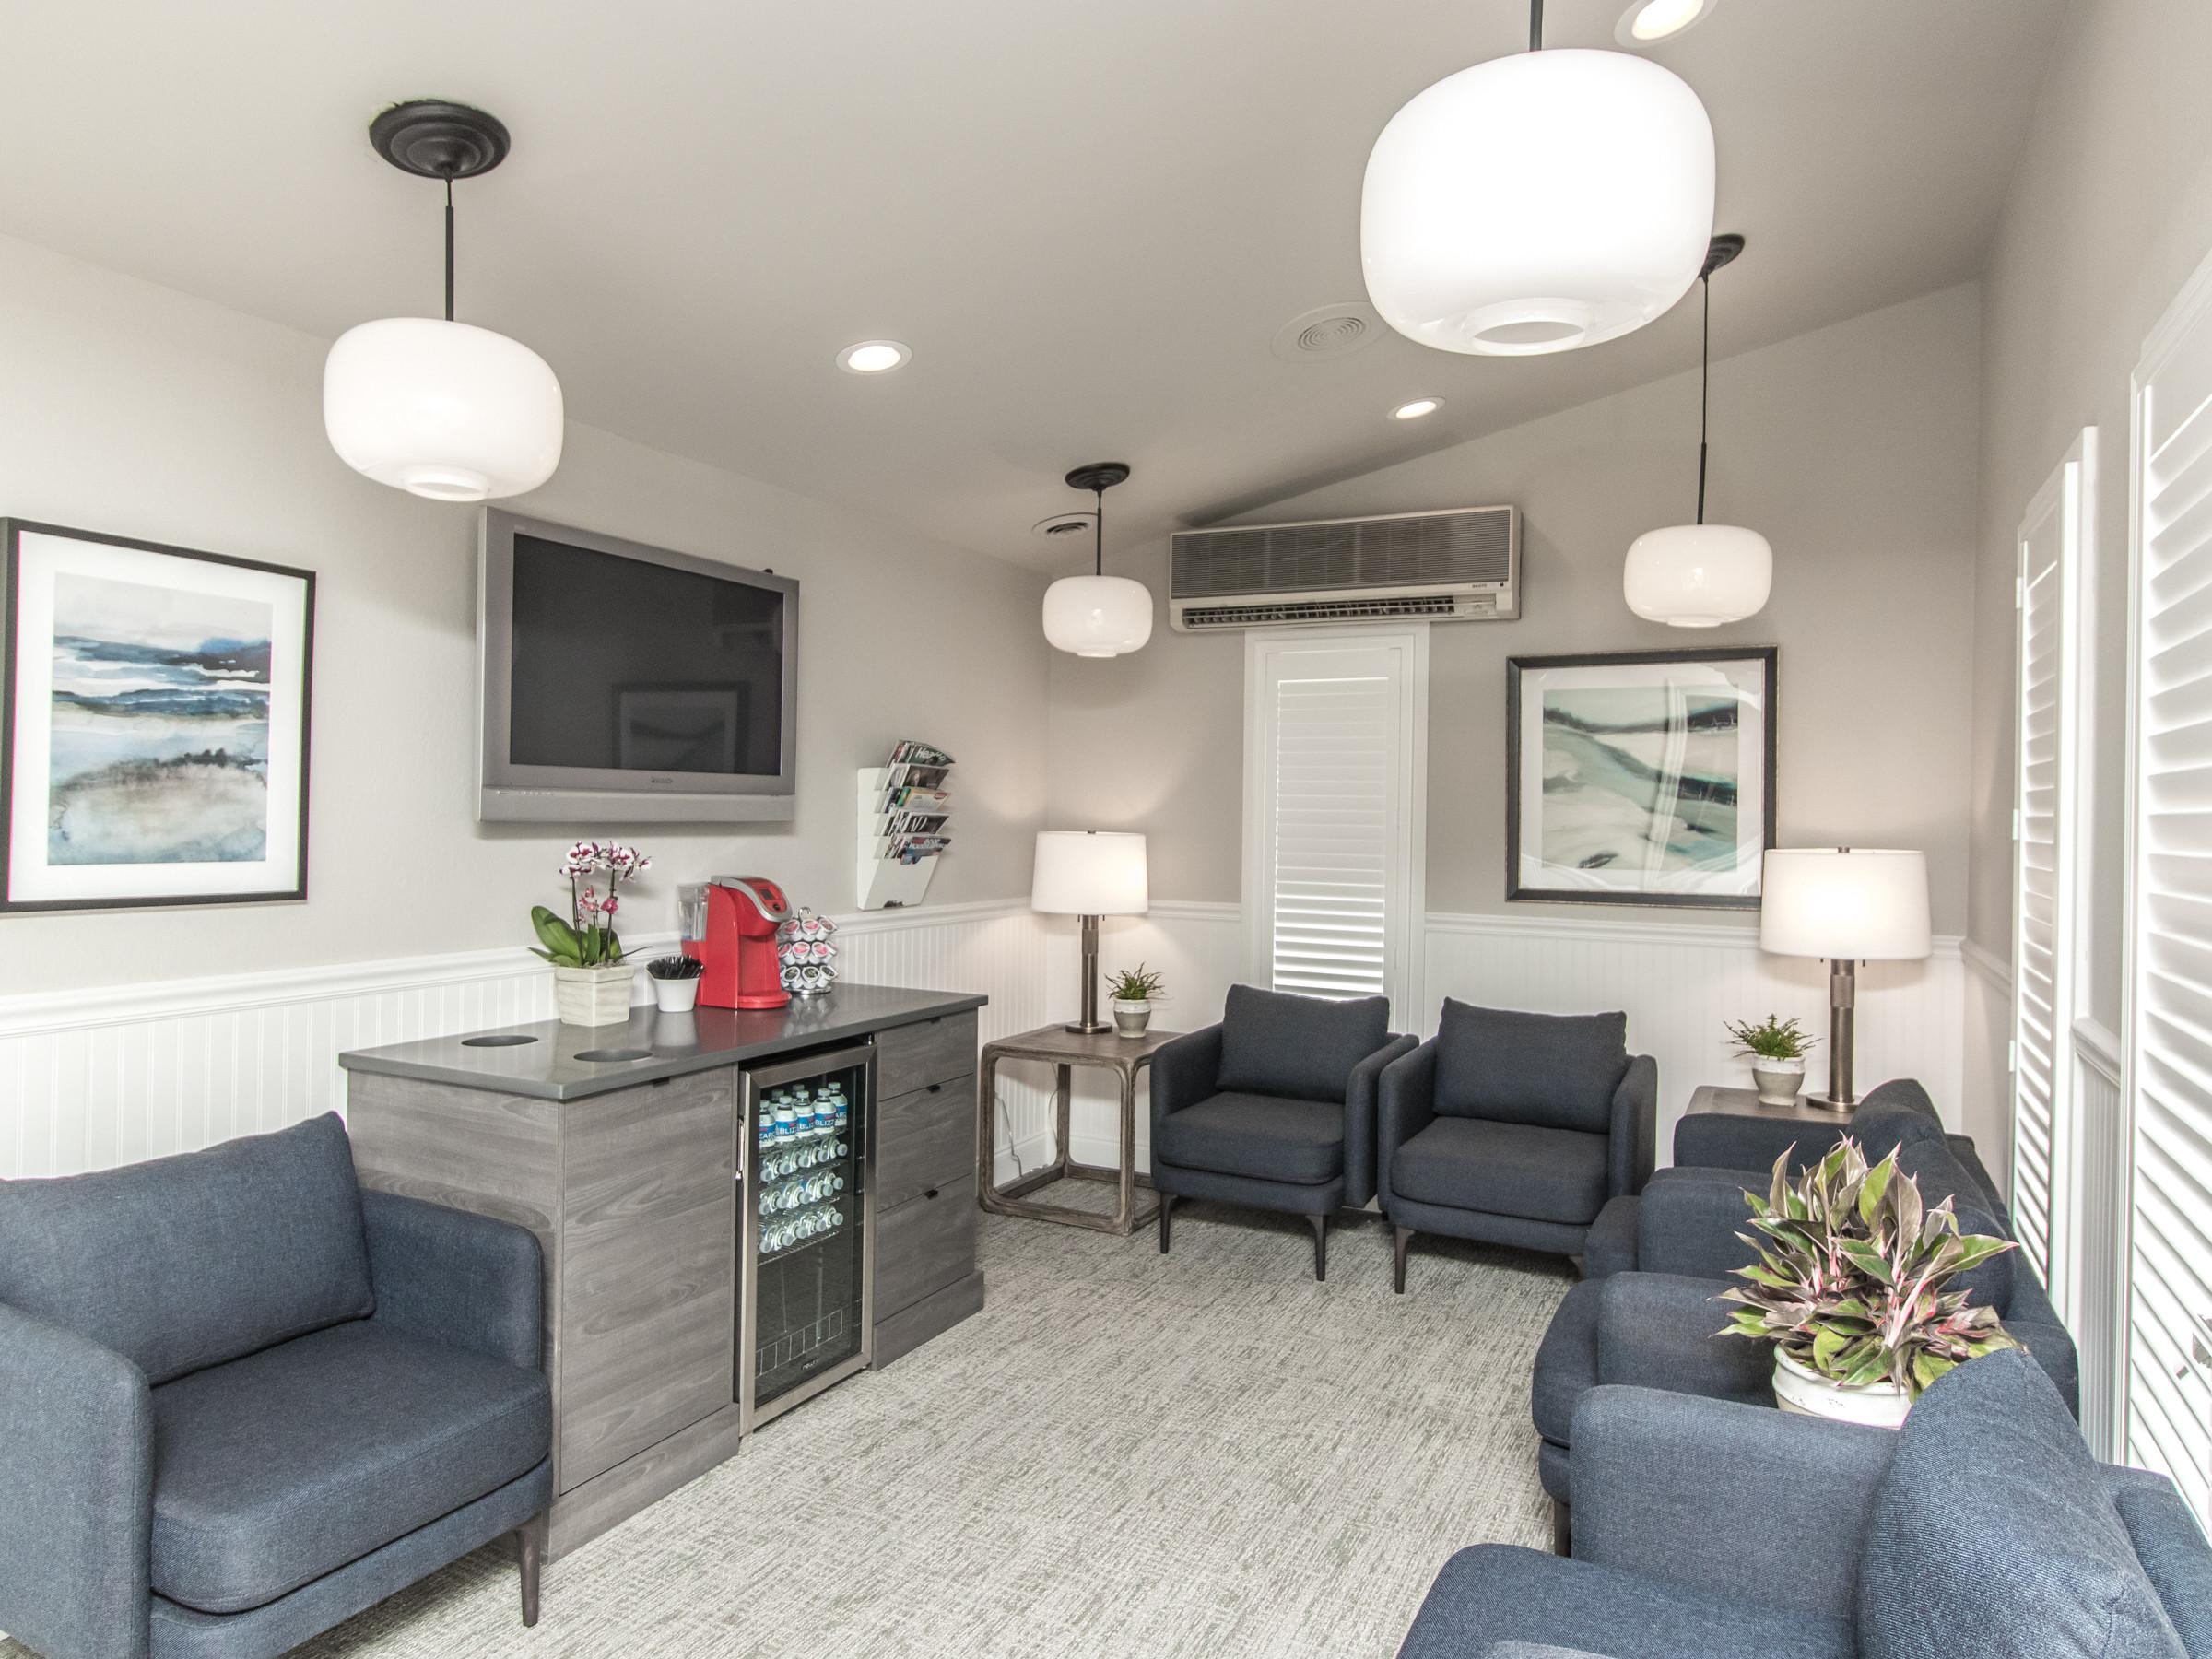 Dental Office Renovations - Waiting Room